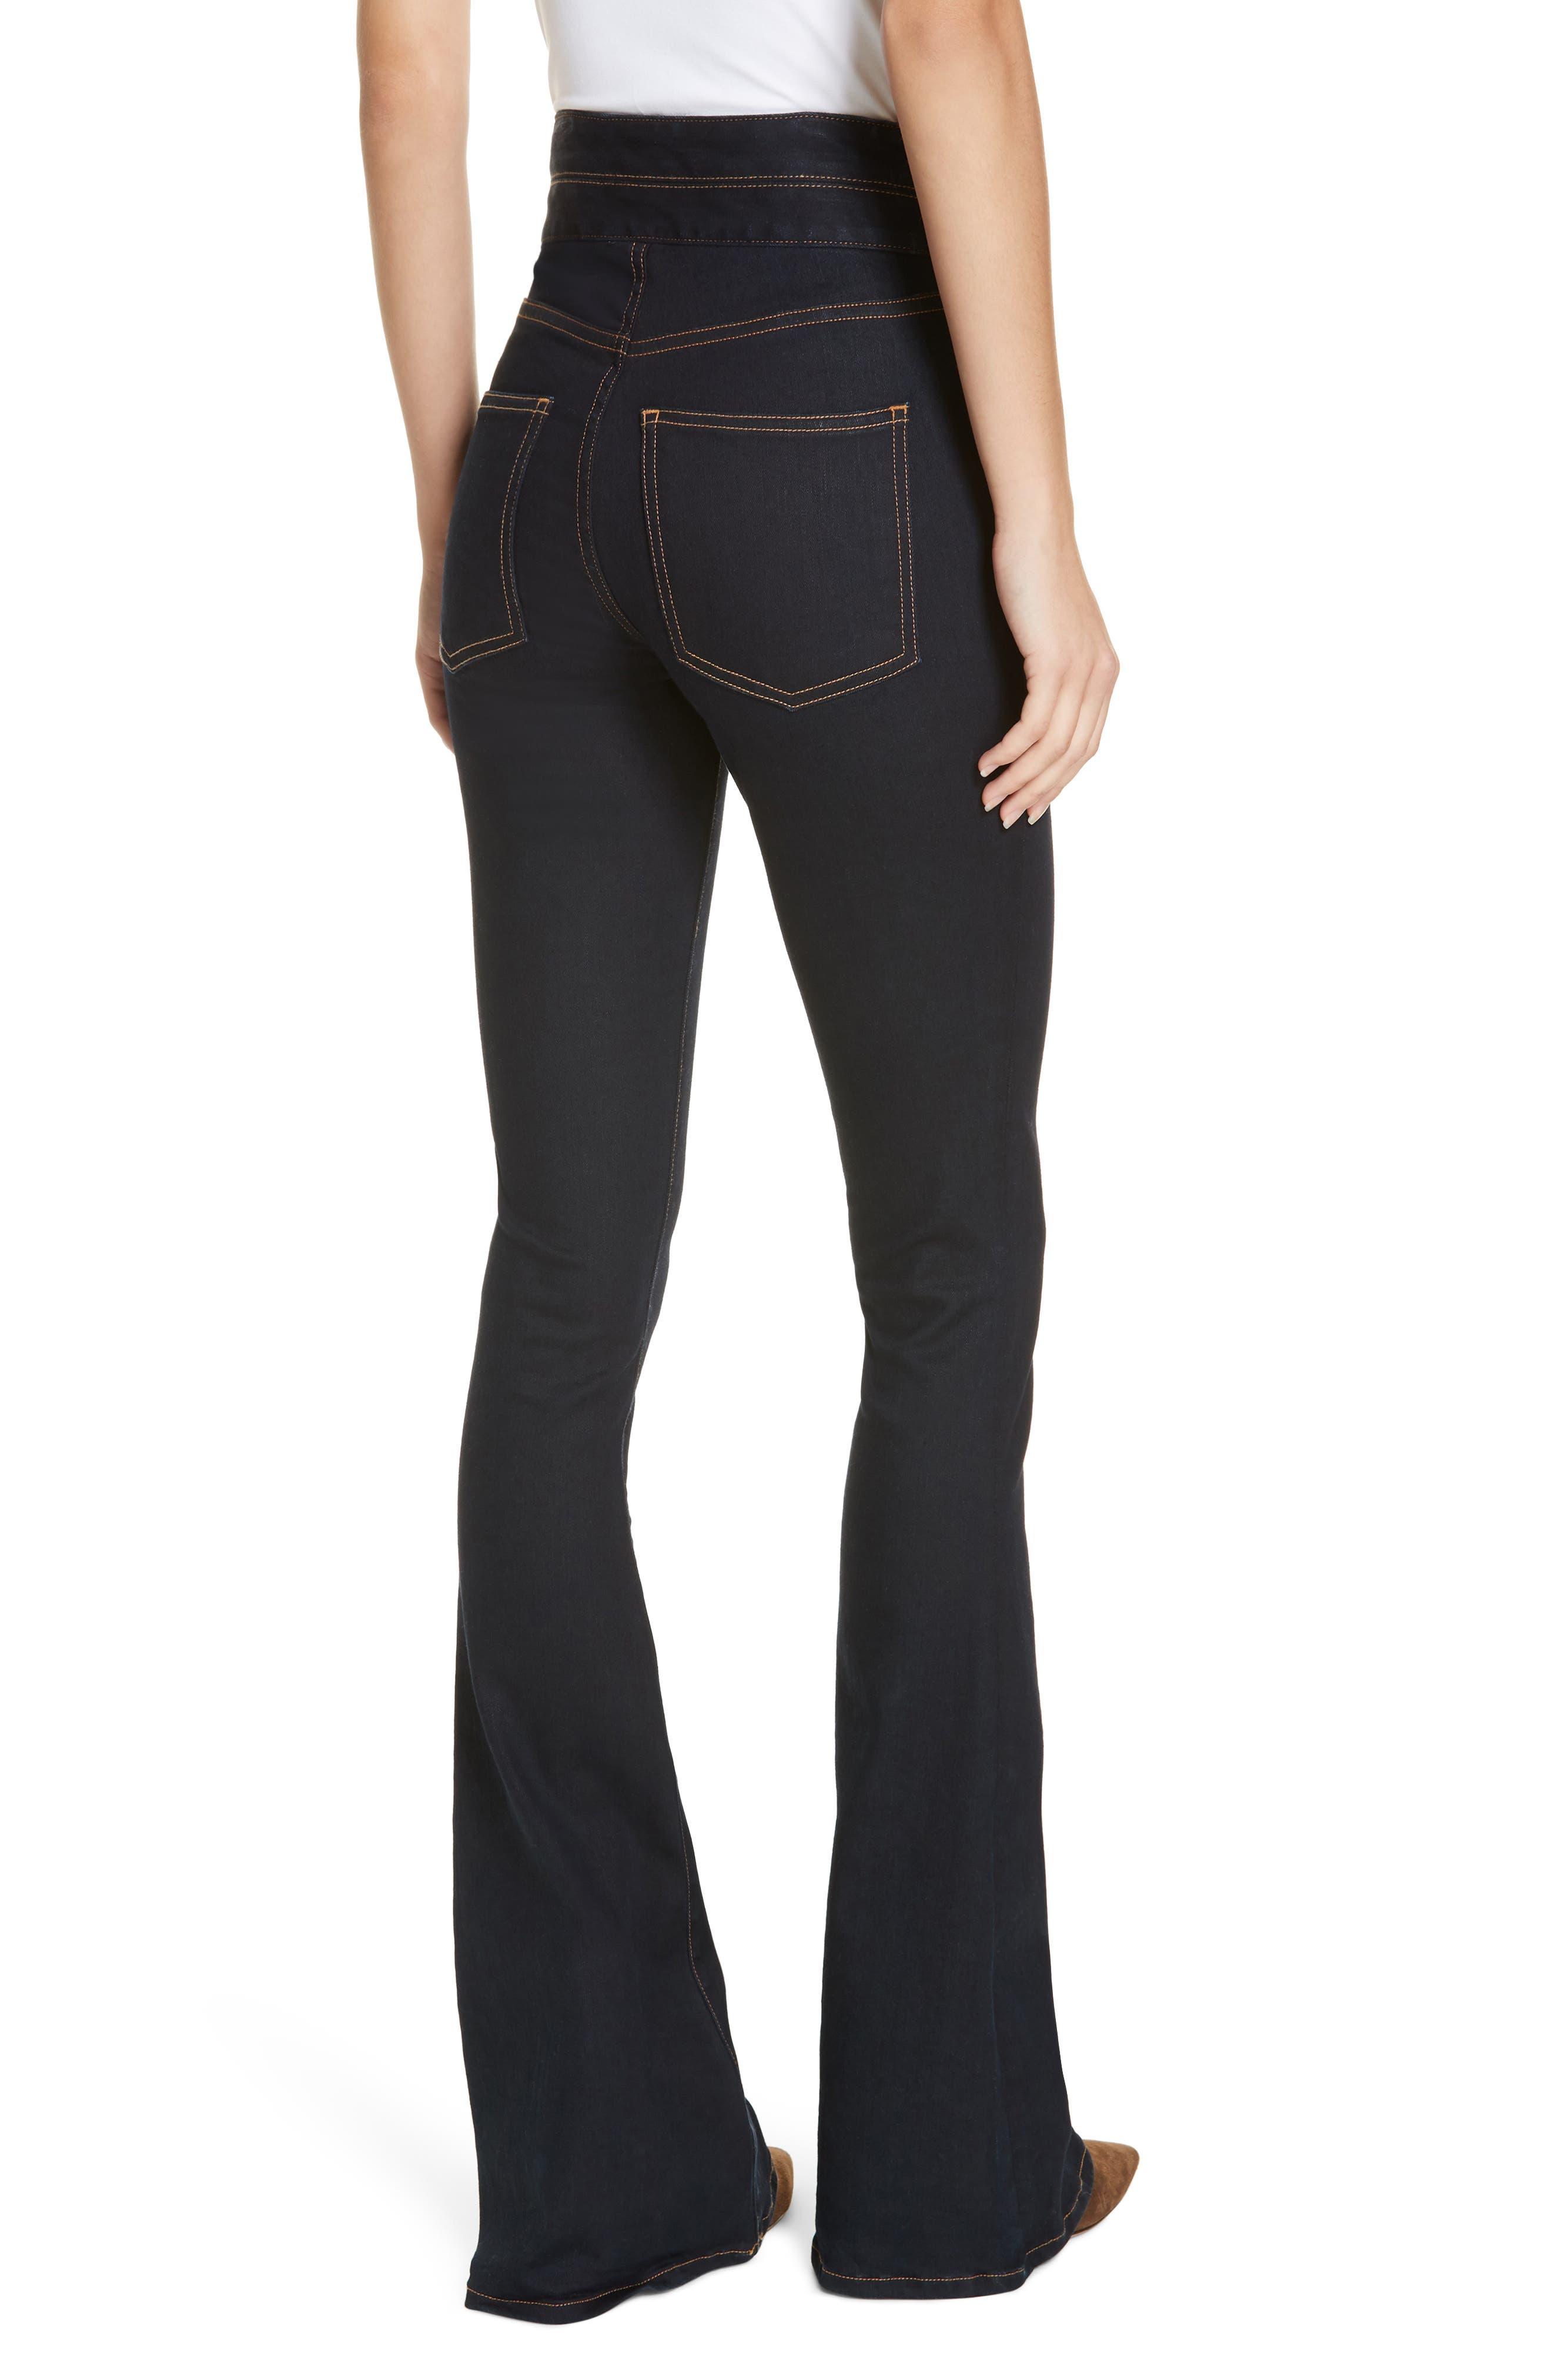 VERONICA BEARD, Dalida Button Detail Skinny Flare Jeans, Alternate thumbnail 2, color, INDIGO